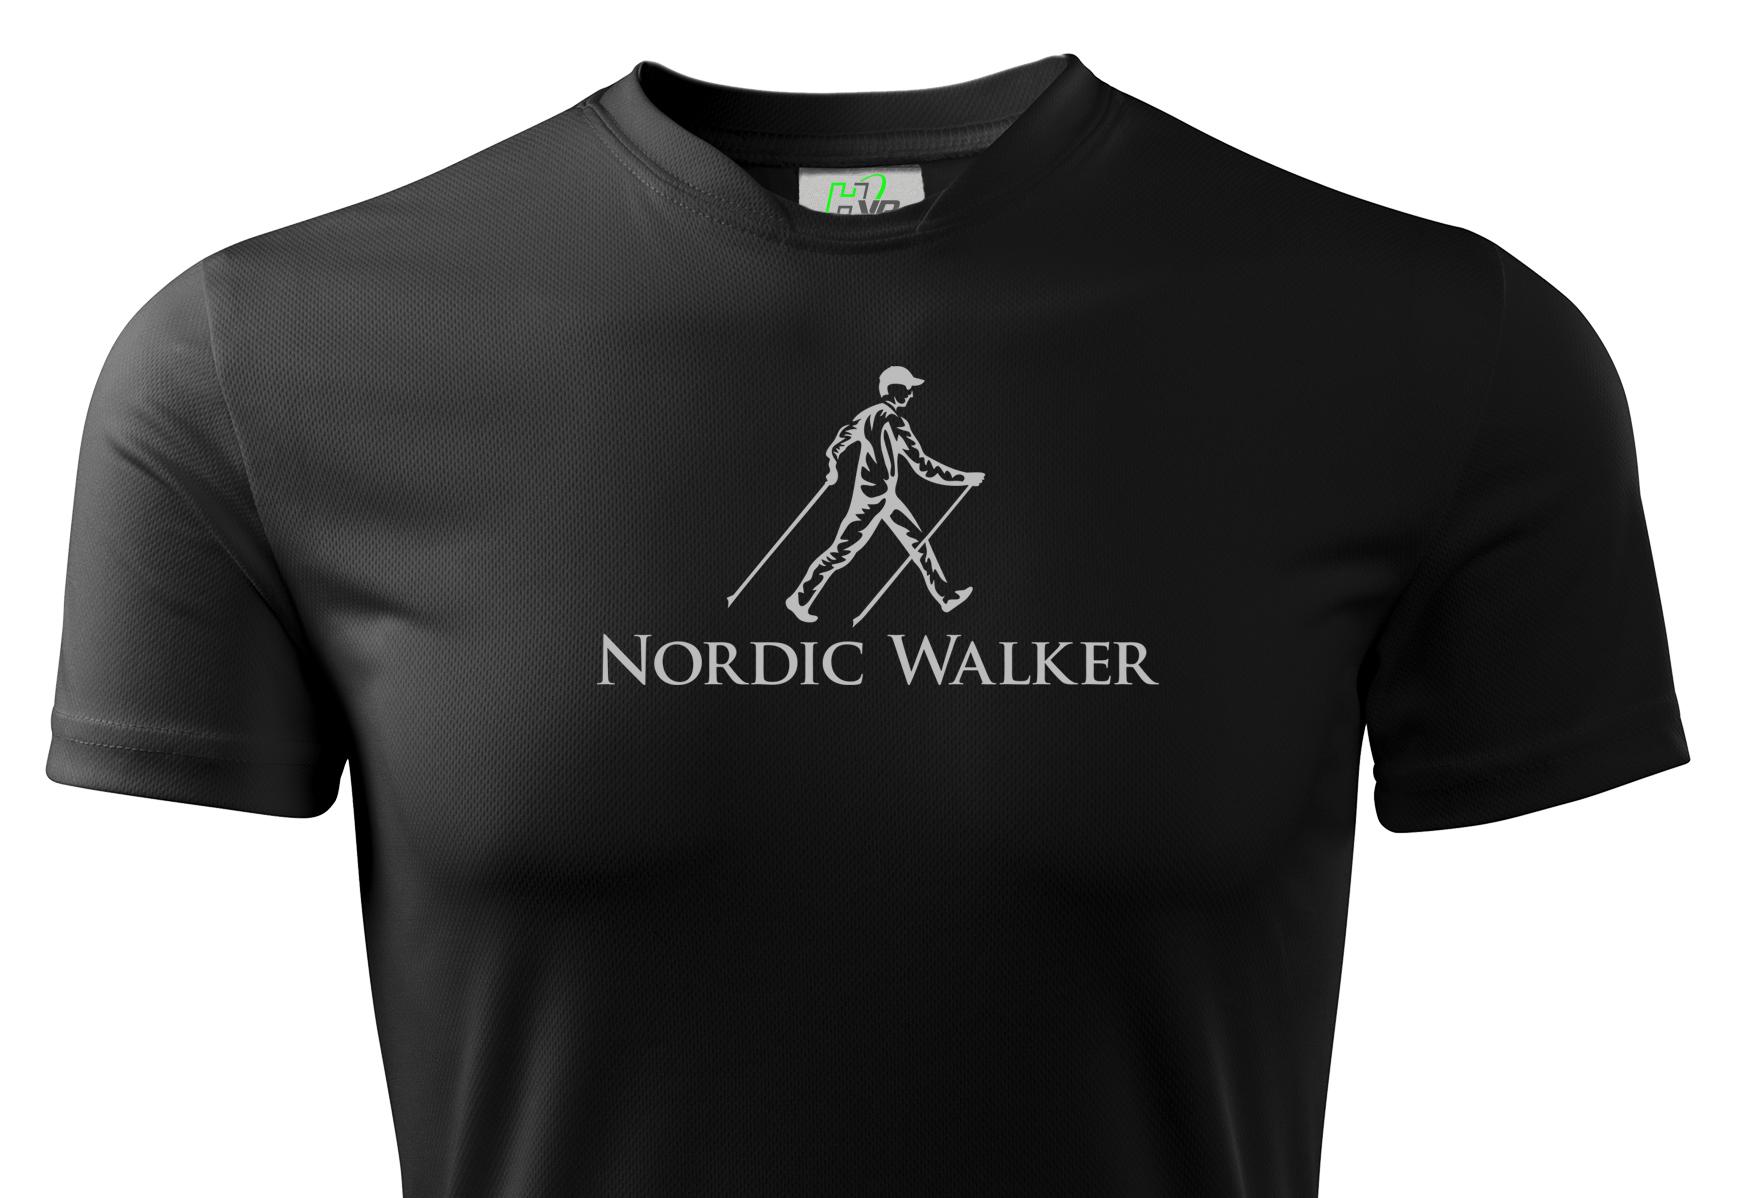 Termálne tričko Nordic Walking Reflexné HVR